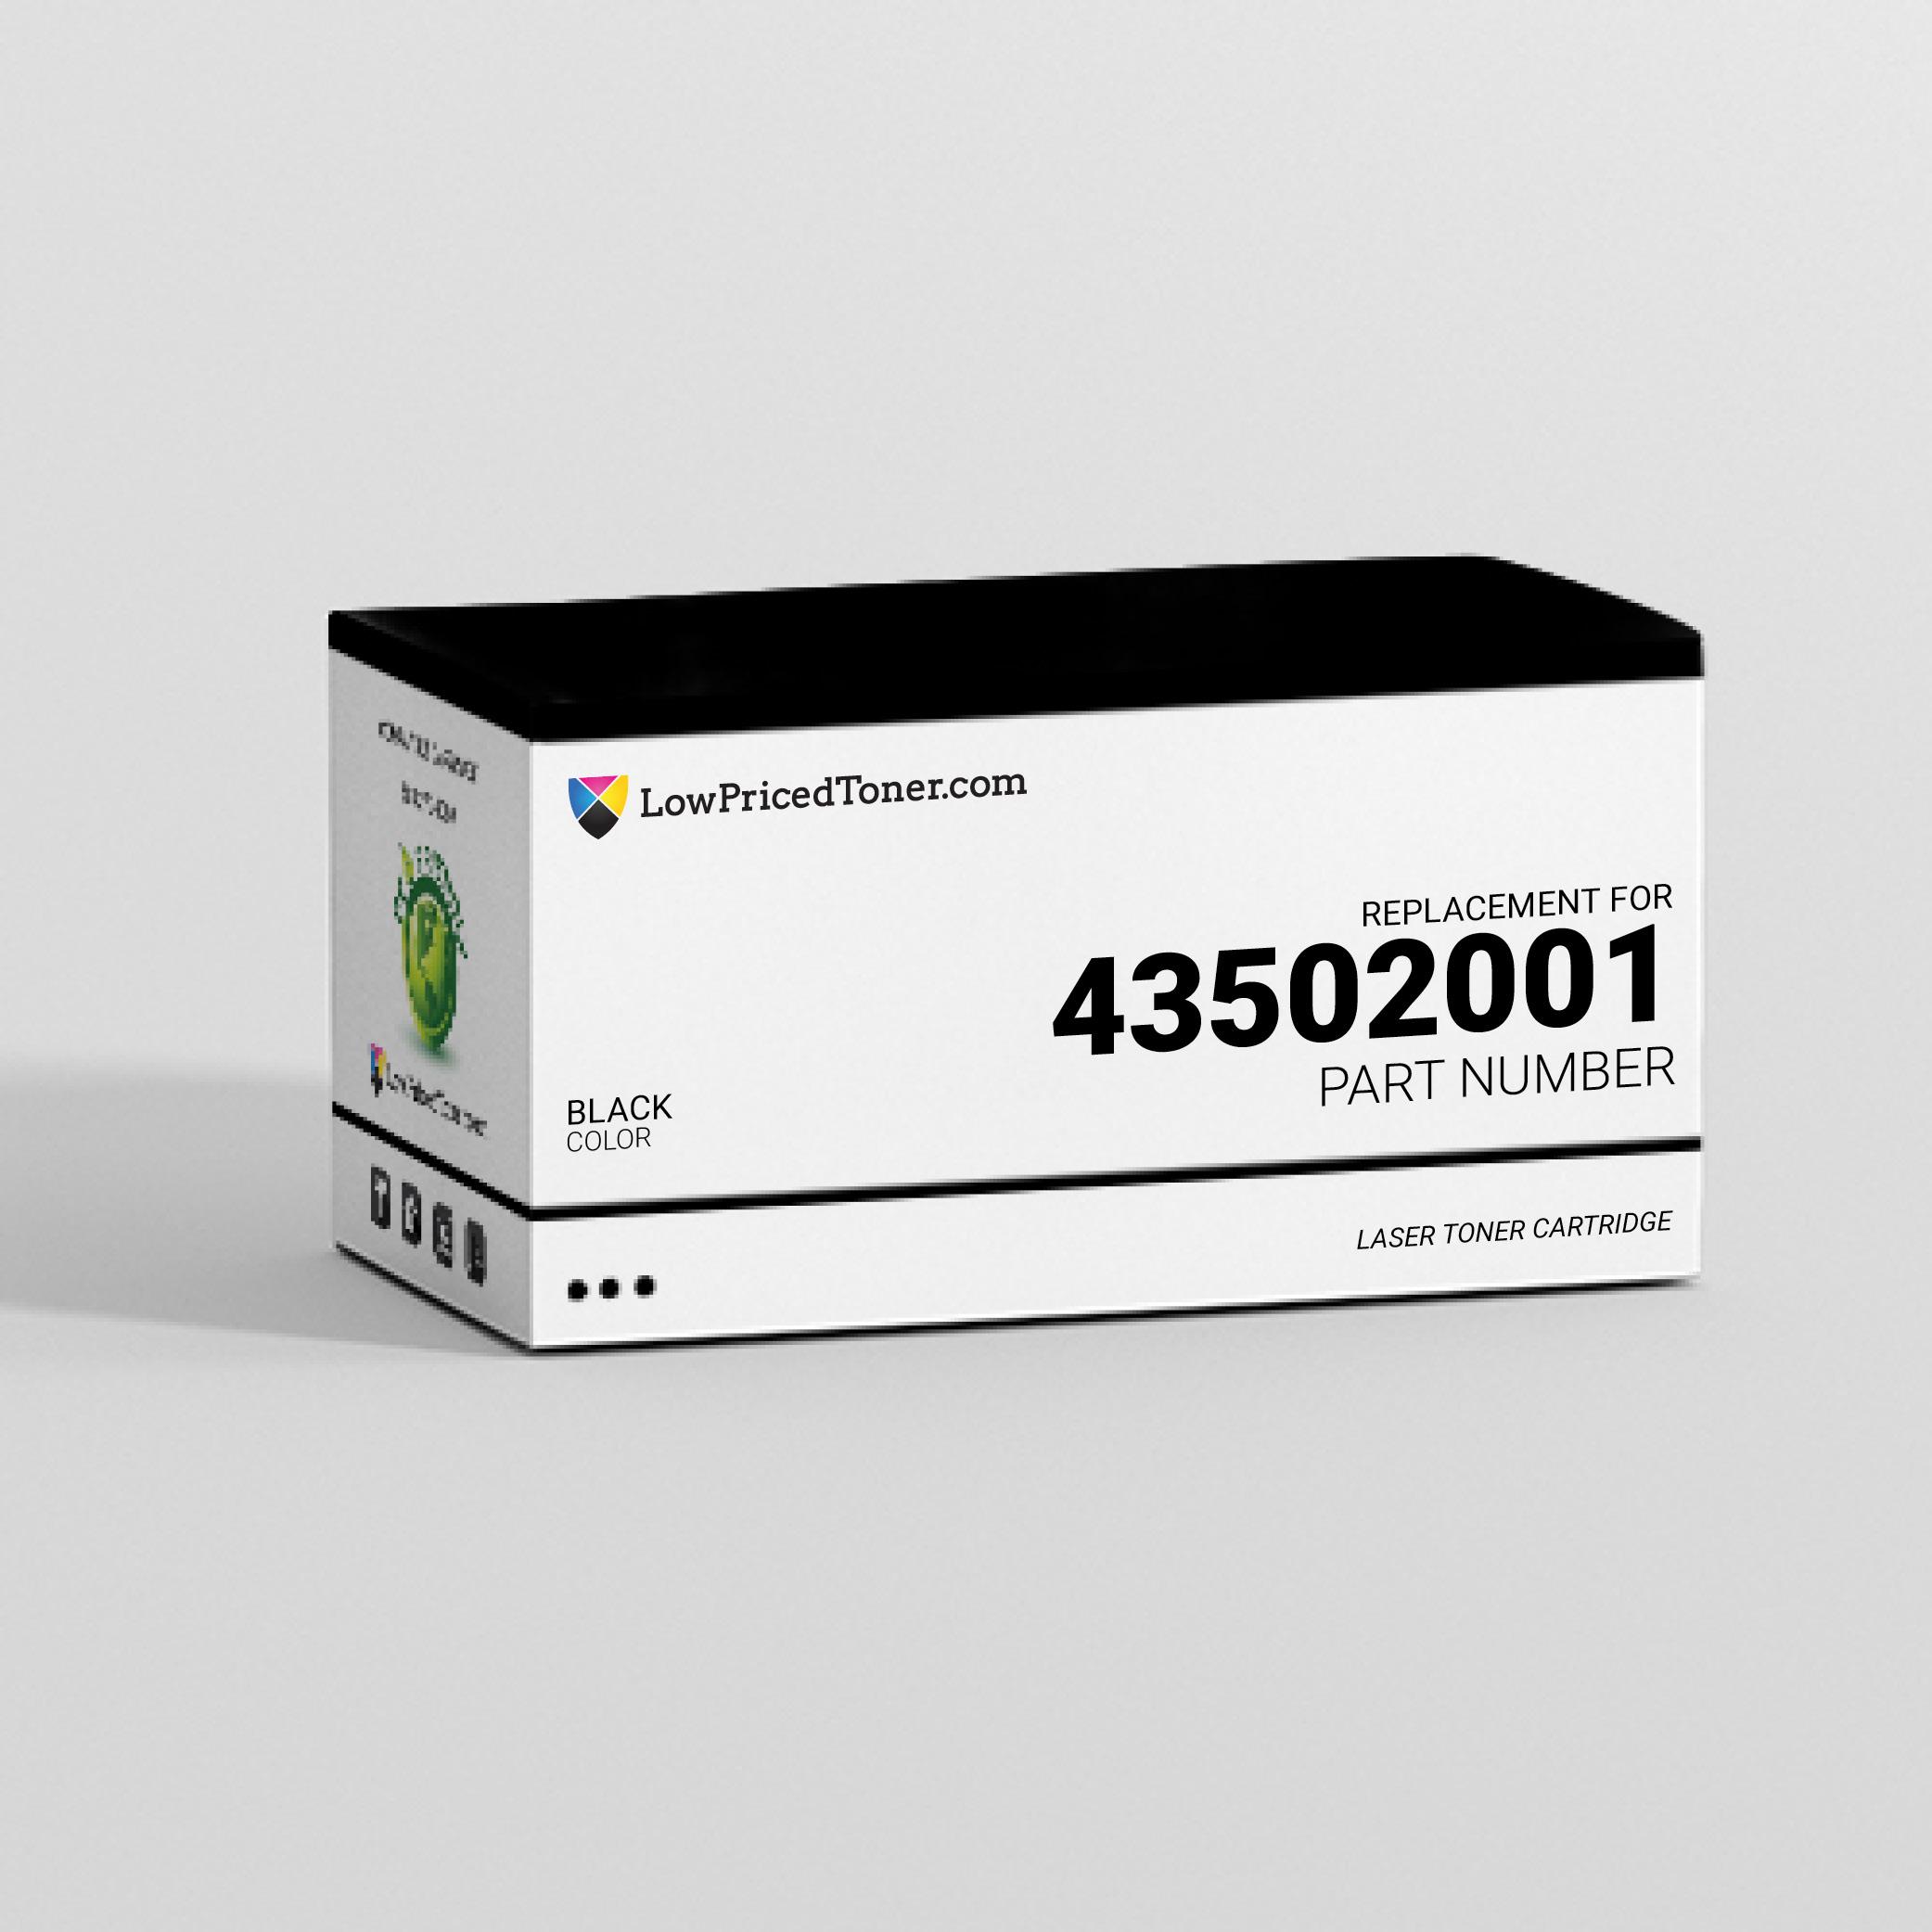 Okidata 43502001 Compatible Black Laser Toner Cartridge